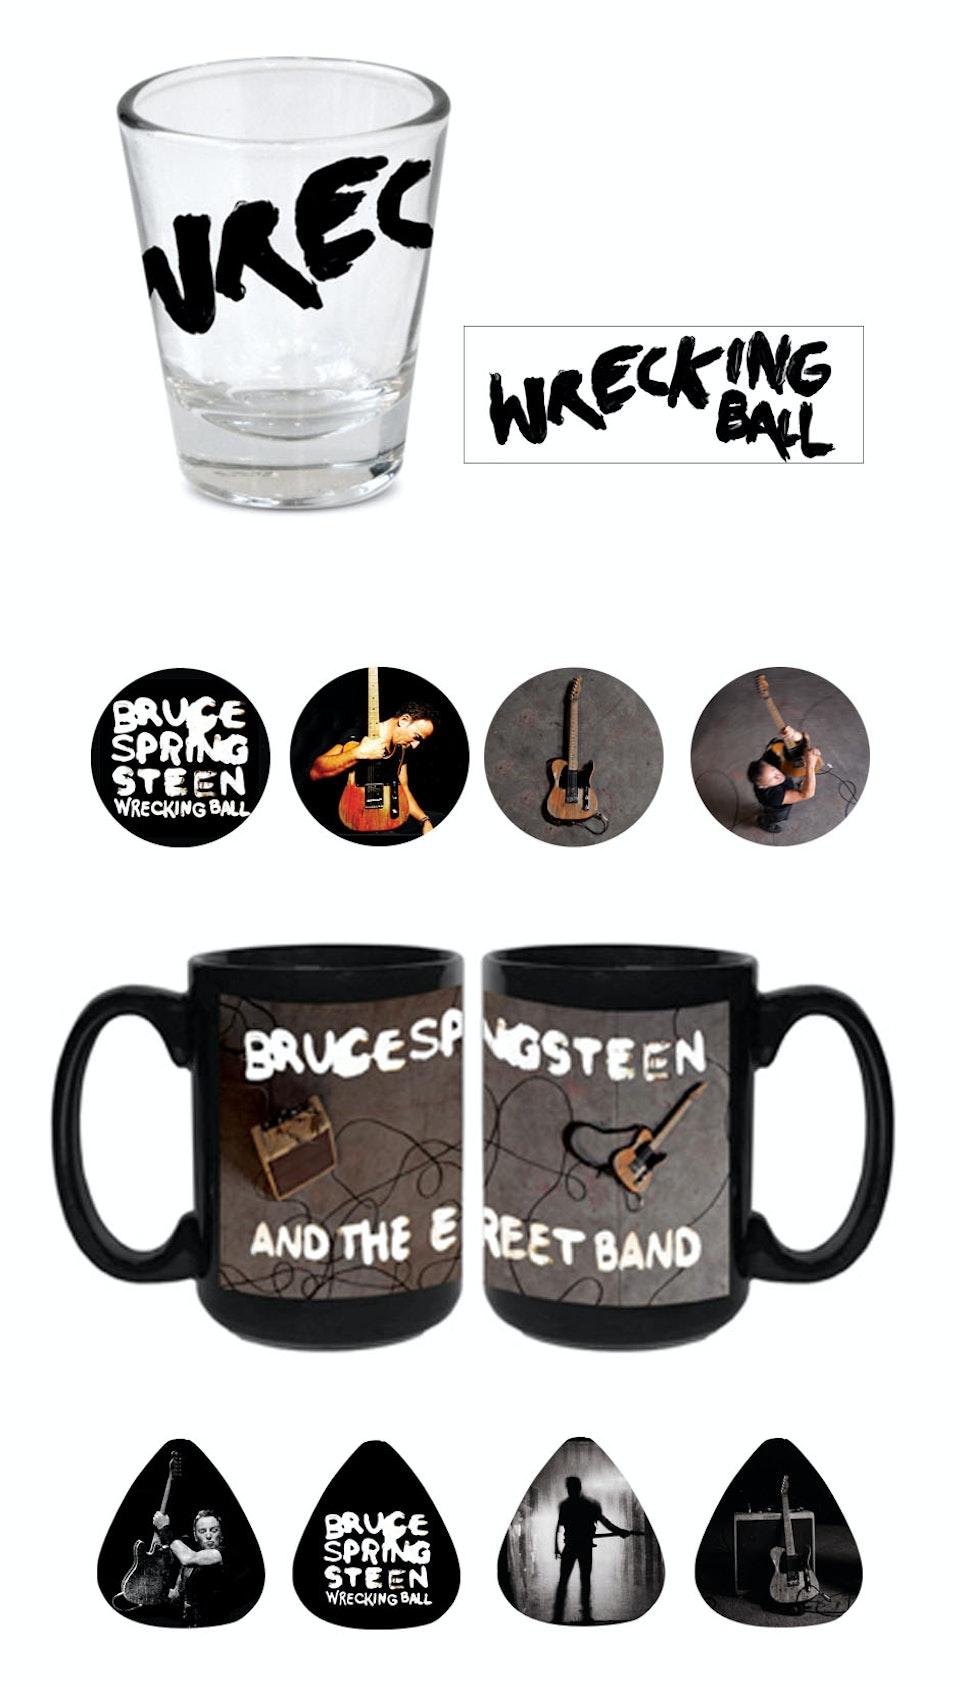 Wrecking Ball Tour Merch - Shot glass, pin, mug and guitar picks